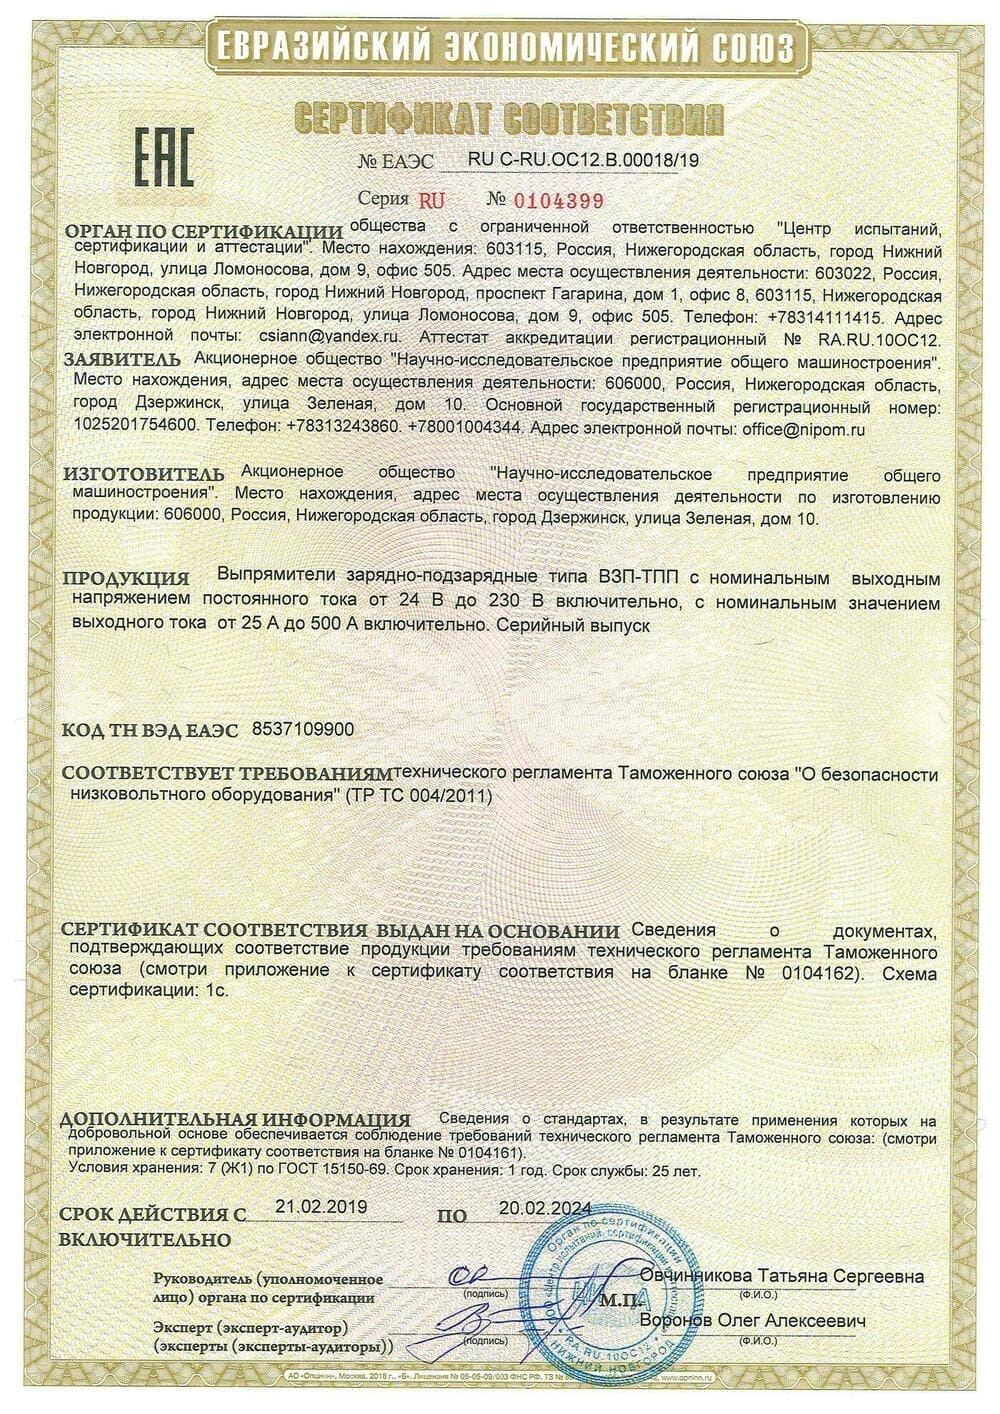 Сертификат таможенного союза картинка